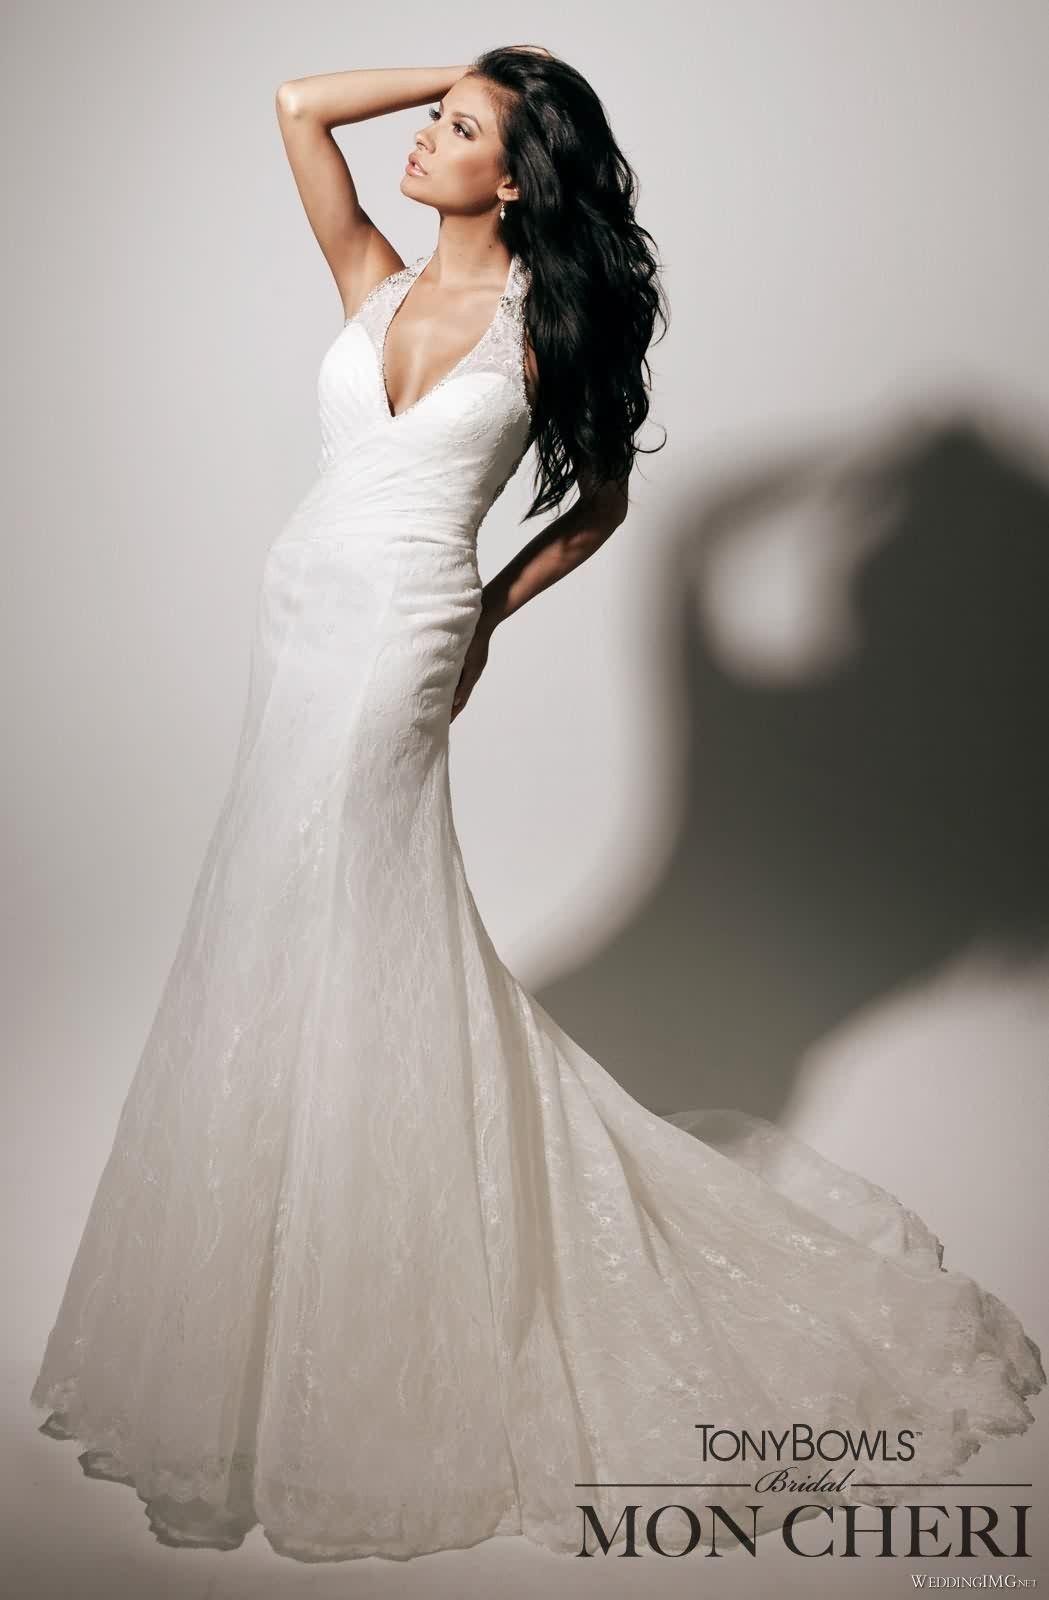 Slim fit wedding dresses  Mon Cheri T Mon Cheri Wedding Dresses Tony Bowls